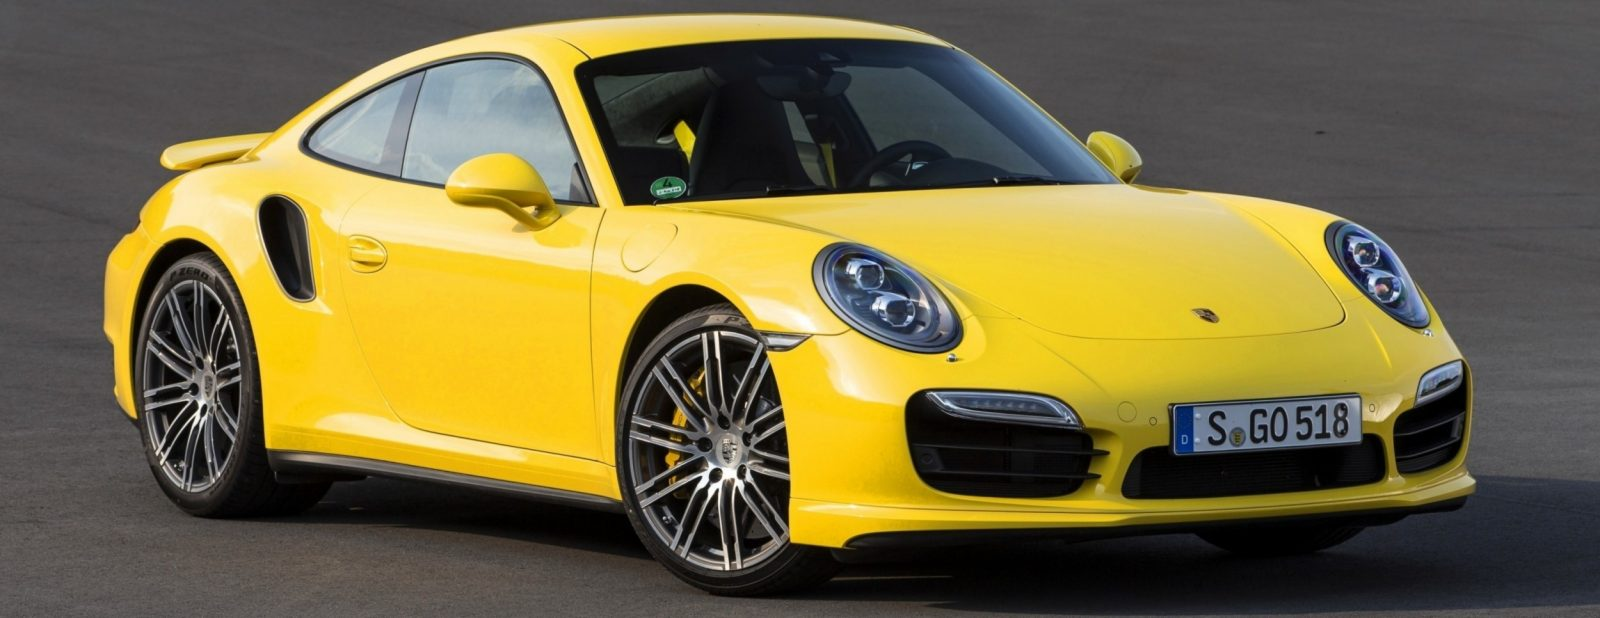 Porsche 911 Turbo _4_